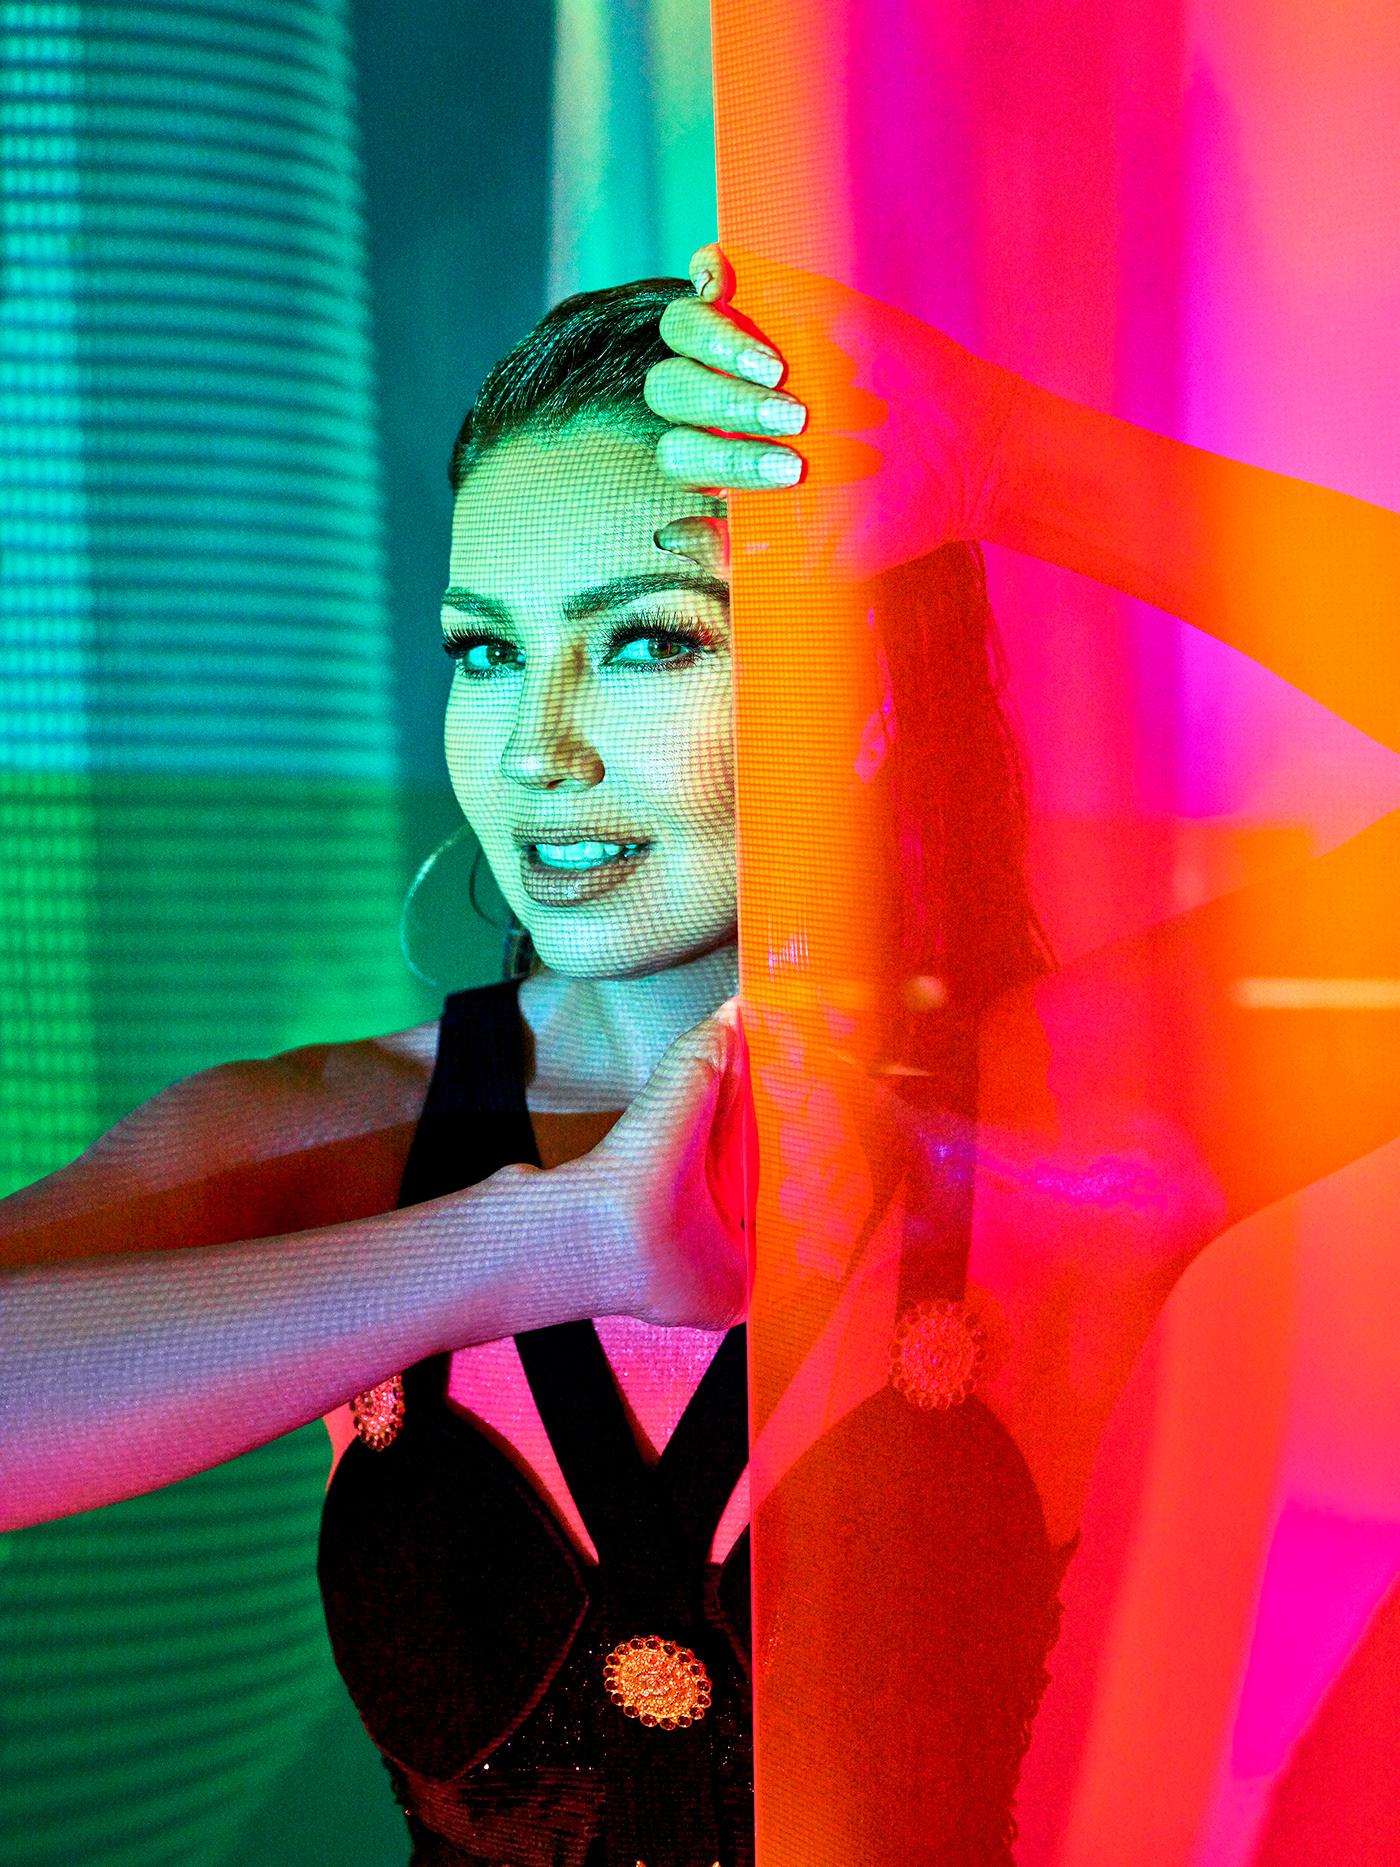 album cover color desAMORfosis Enrique Vega Latin Music music thalia thalia sodi